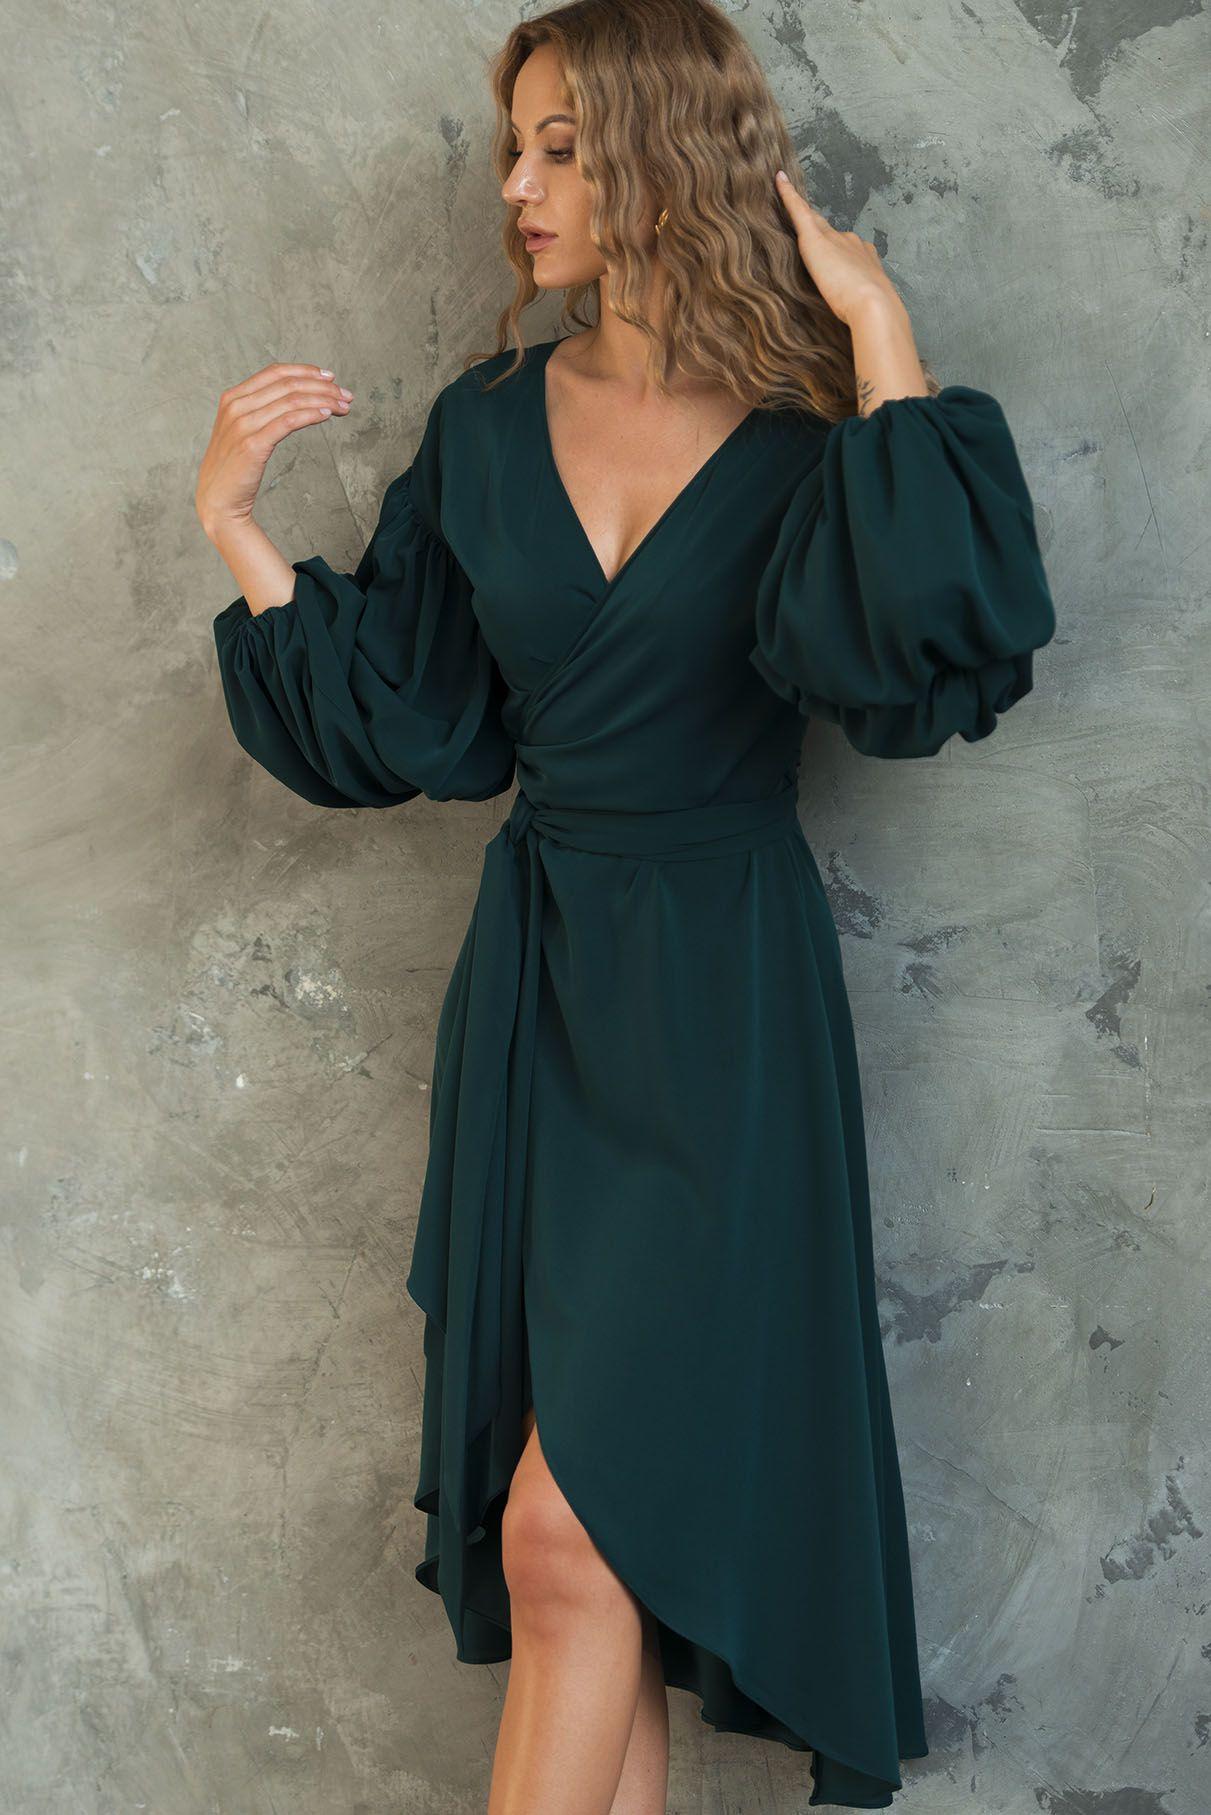 Emerald wrapover dress nice top to bottom fashion